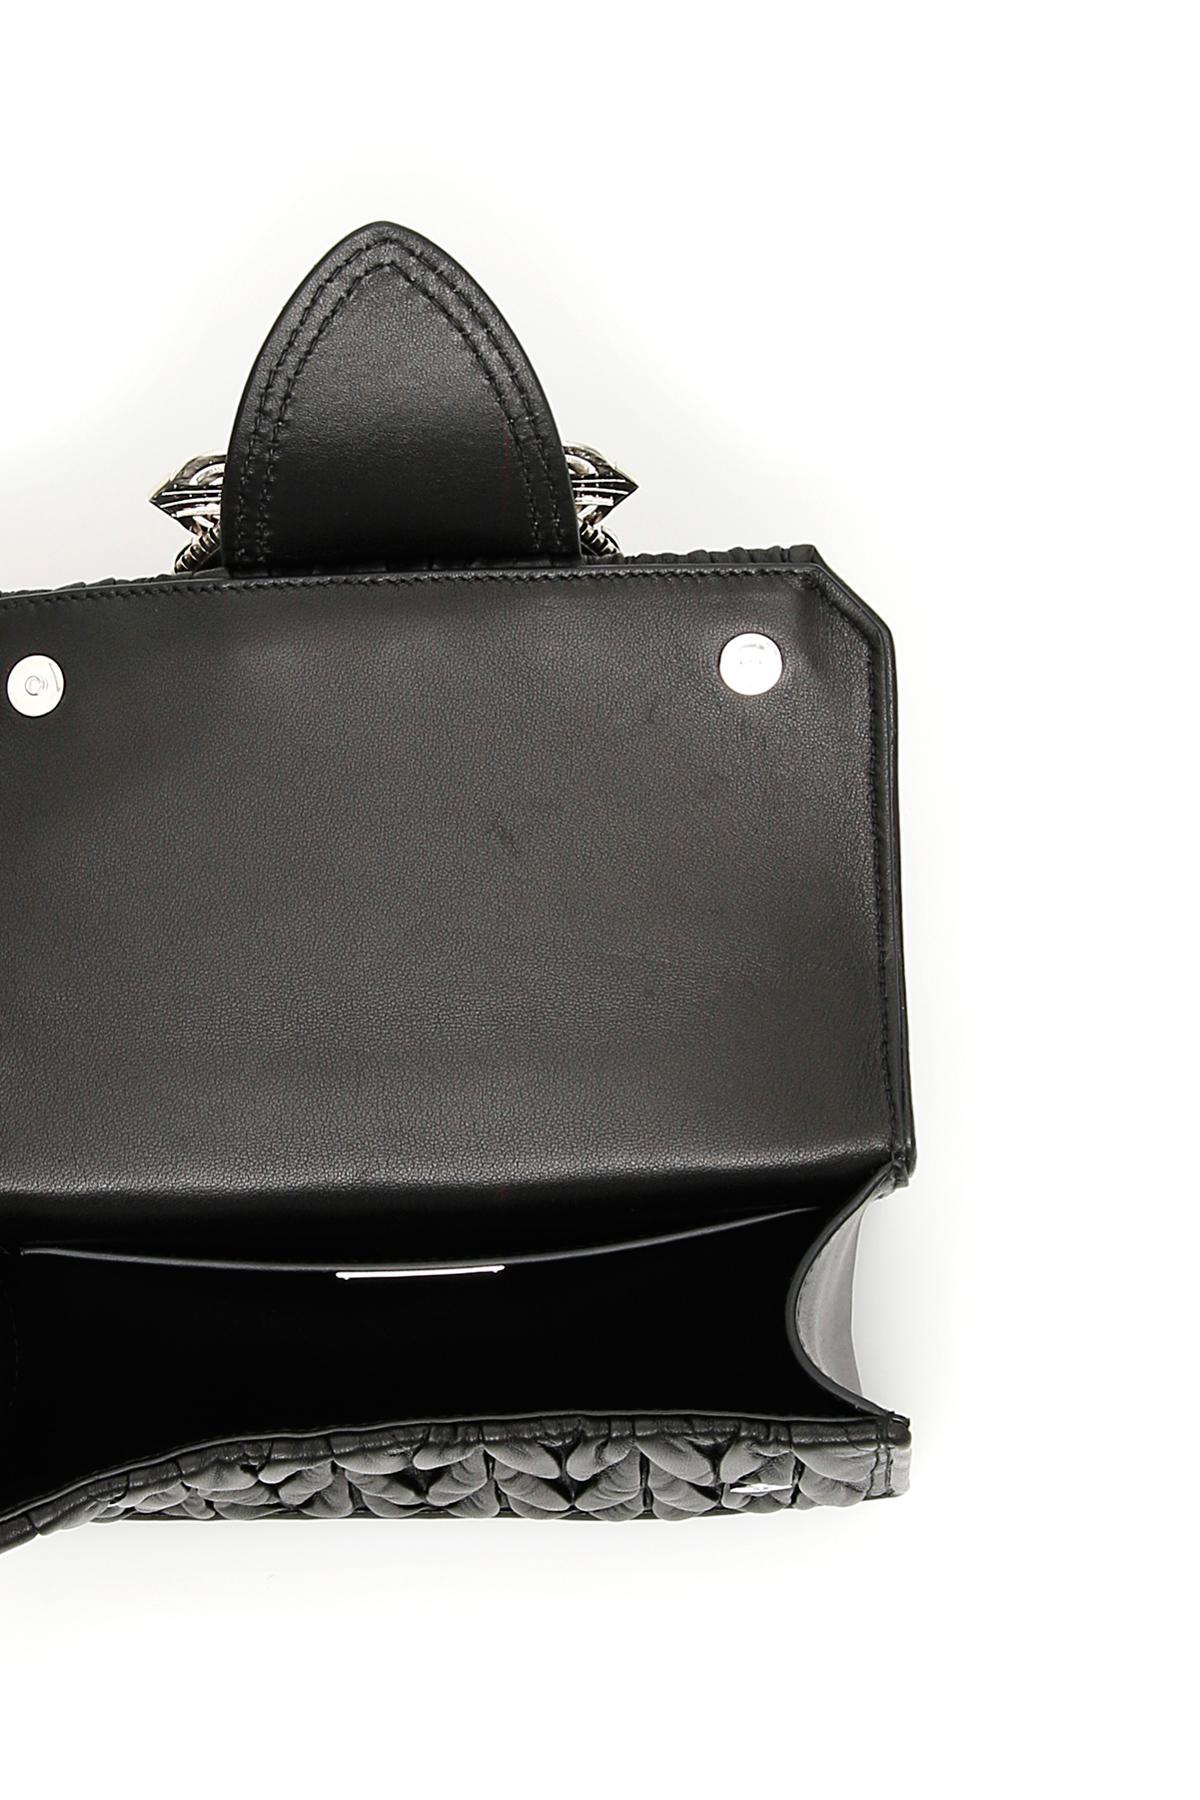 f8b80d96b916 ... Miu Lady Crossbody Bag - Lyst. View fullscreen